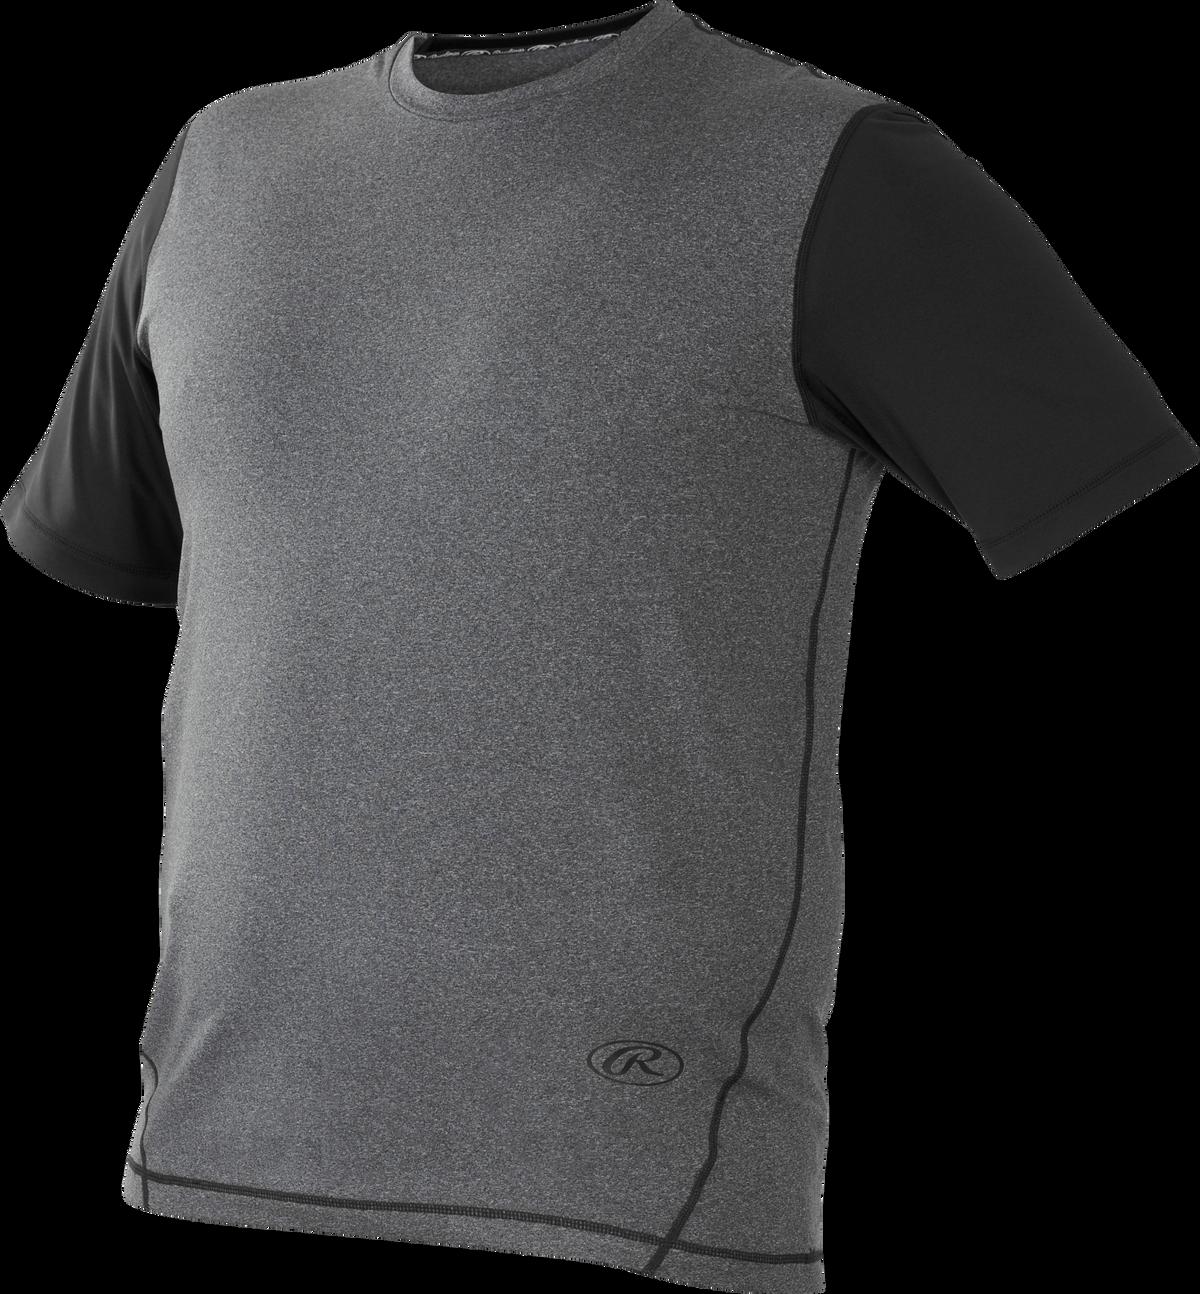 Rawlings Adult Pro-Dri Short Sleeve Performance Shirt